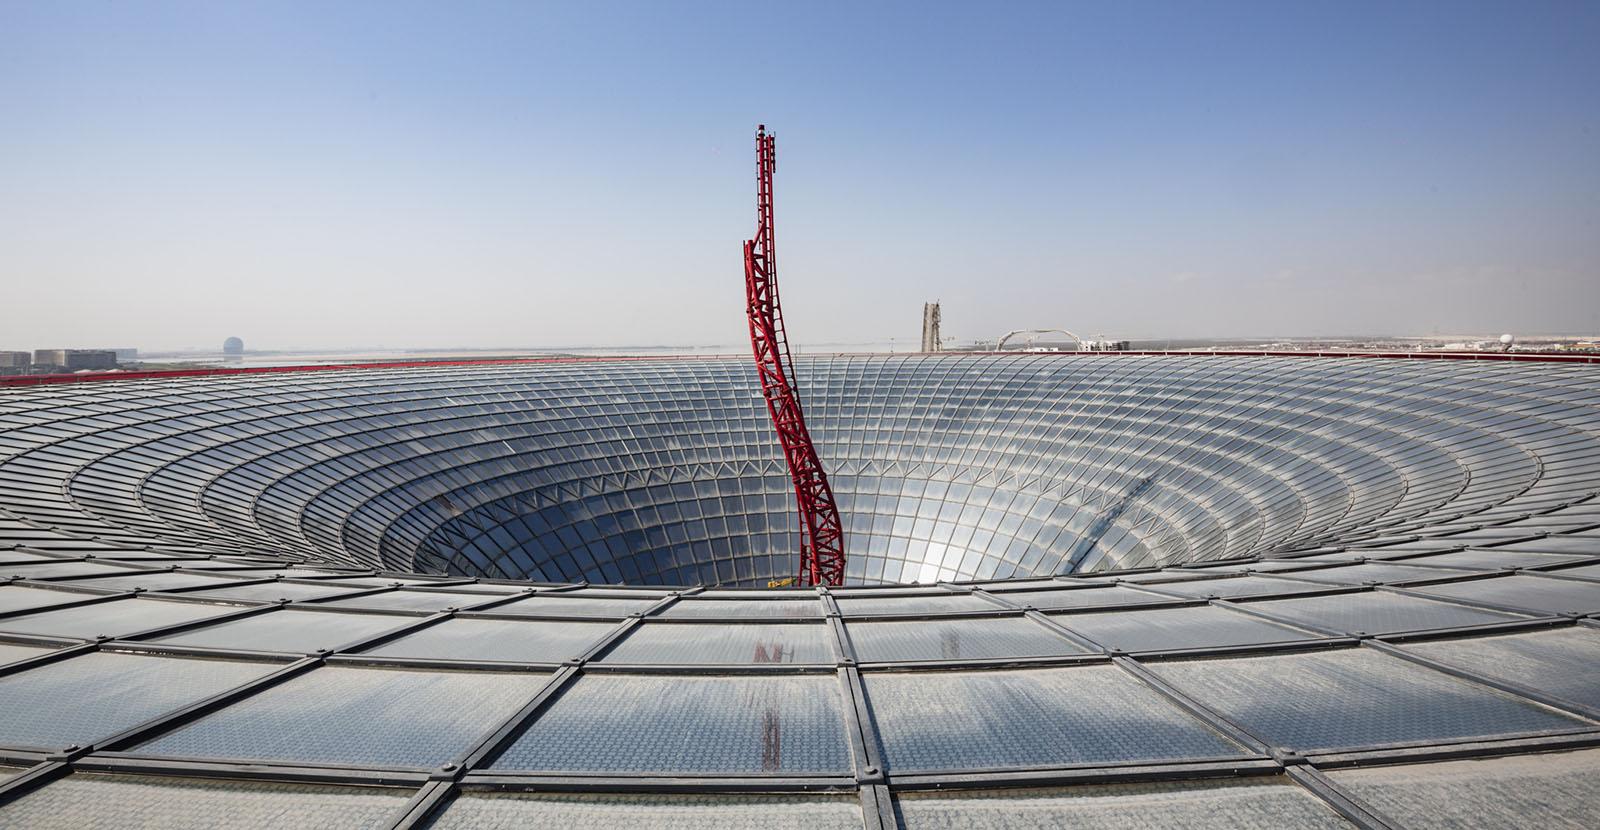 Two New Coasters Opening at Ferrari World Abu Dhabi in 2017